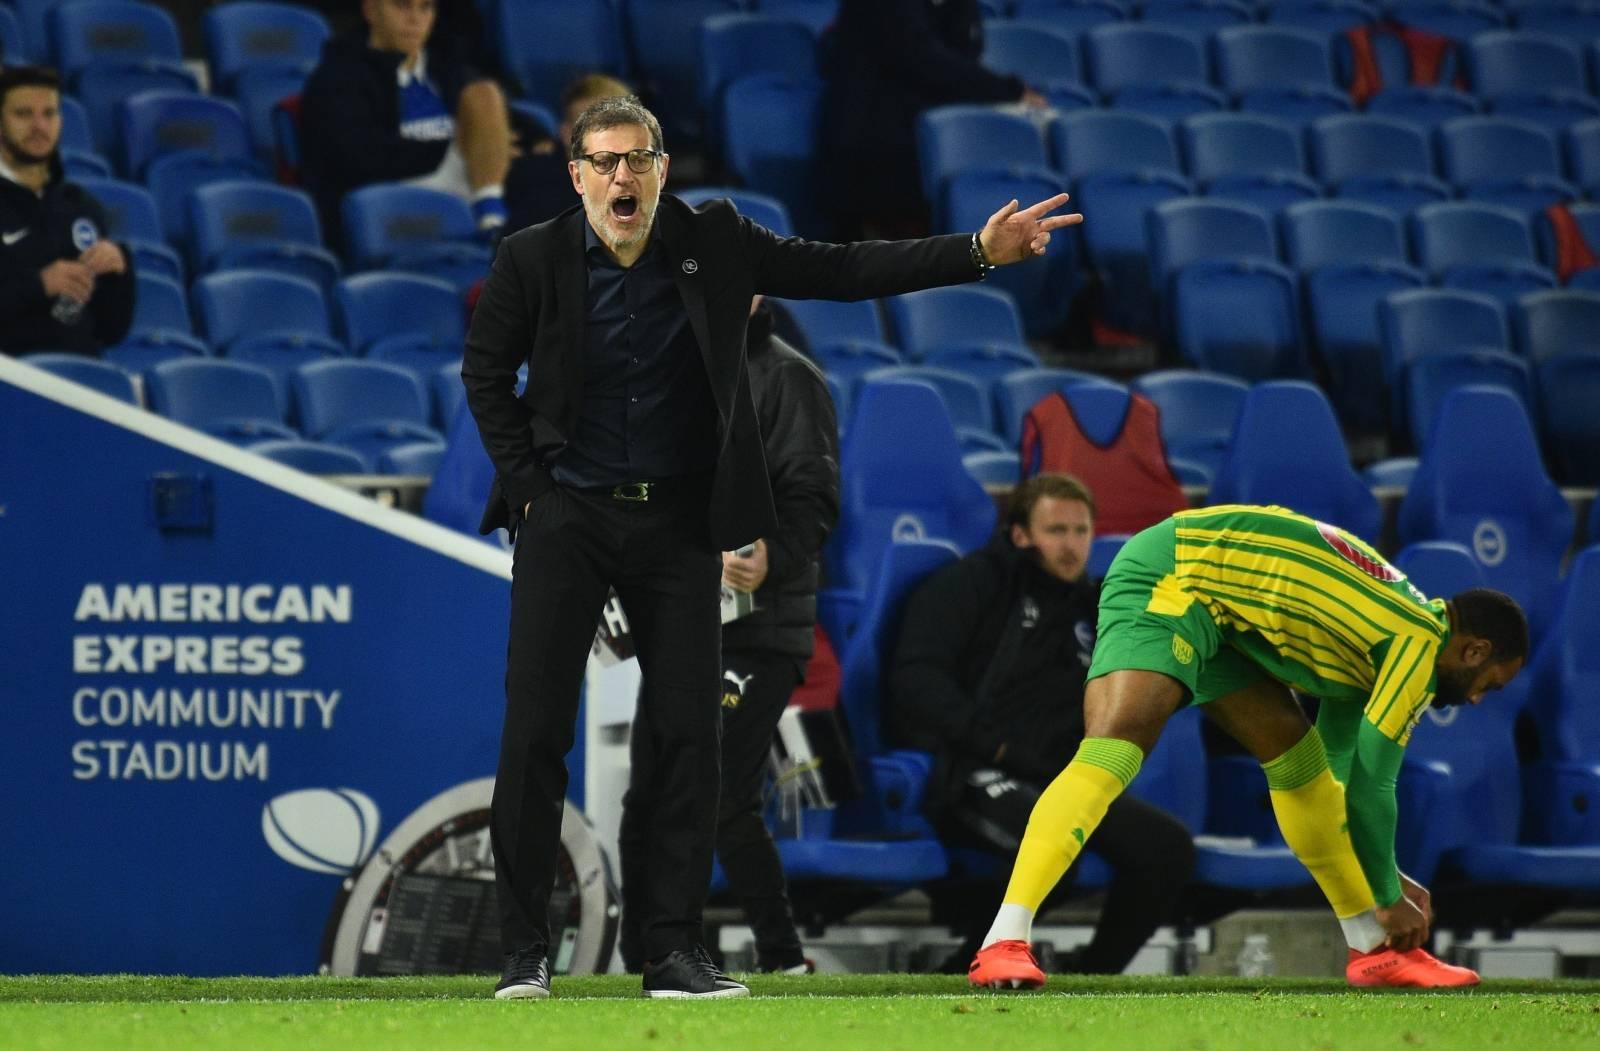 Premier League - Brighton & Hove Albion v West Bromwich Albion